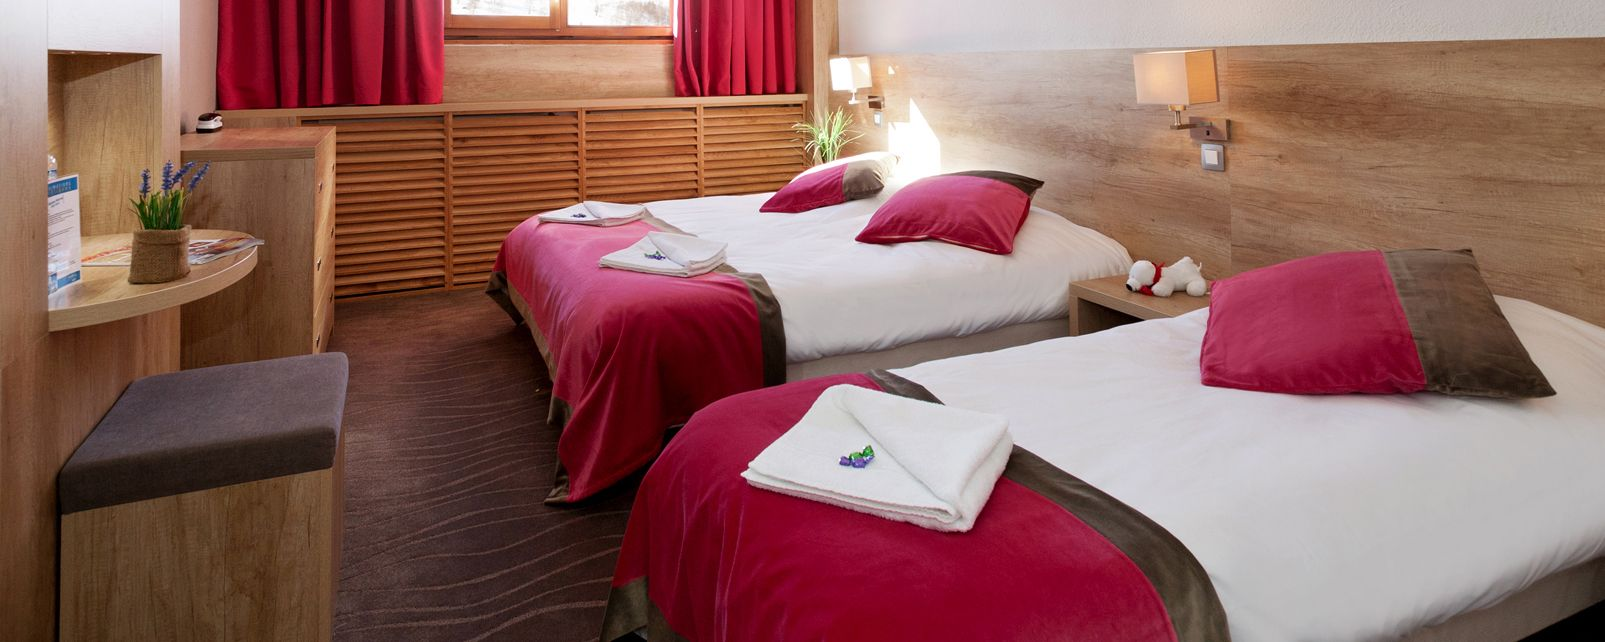 h tel club mmv les deux alpes le panorama. Black Bedroom Furniture Sets. Home Design Ideas